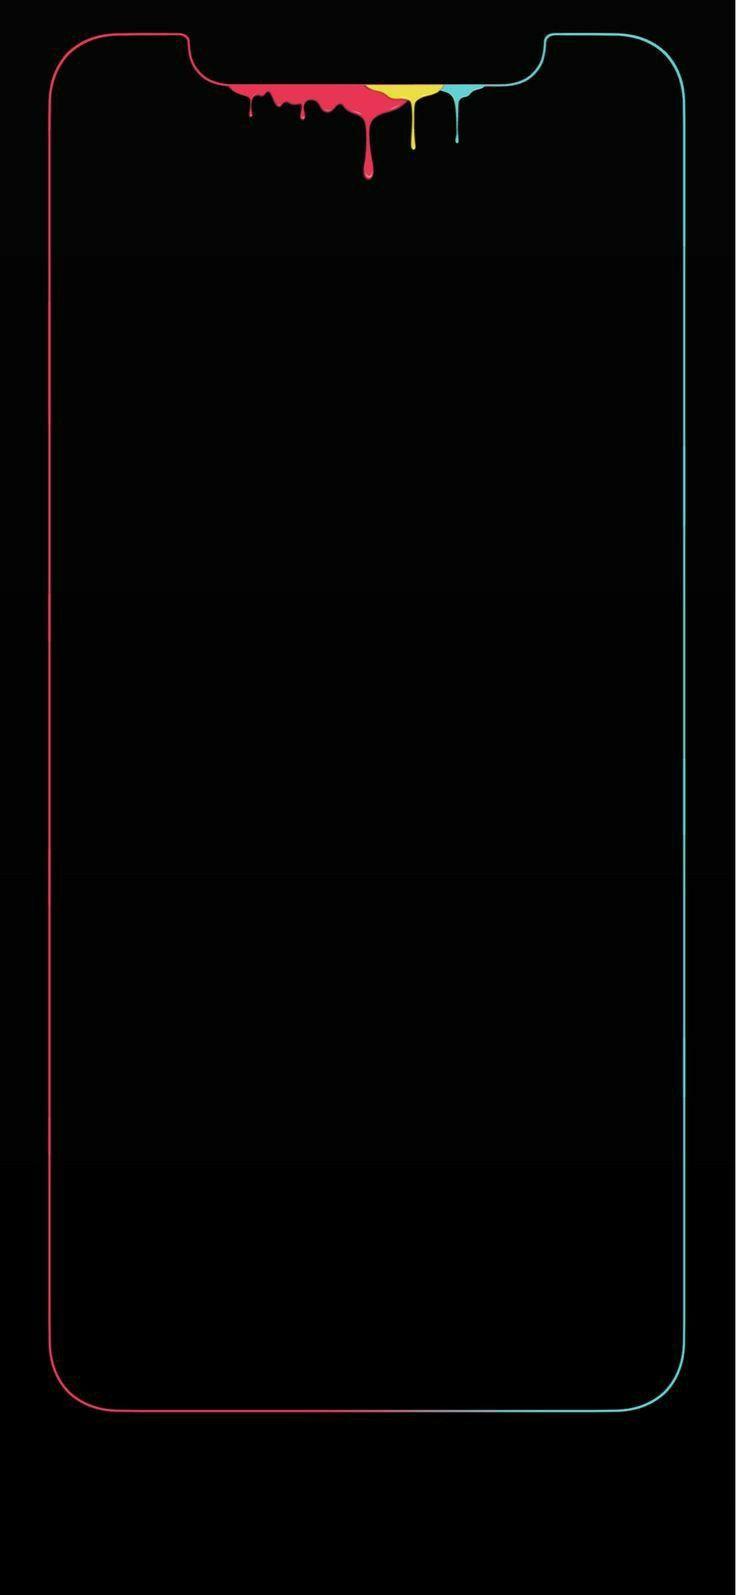 Oneplus 6 Wallpaper Neversettle Oneplus Oneplus6 Hdwallpaper 1080x2280 Wallpaper Nike Iph Oneplus Wallpapers Black Phone Wallpaper Dark Wallpaper Iphone